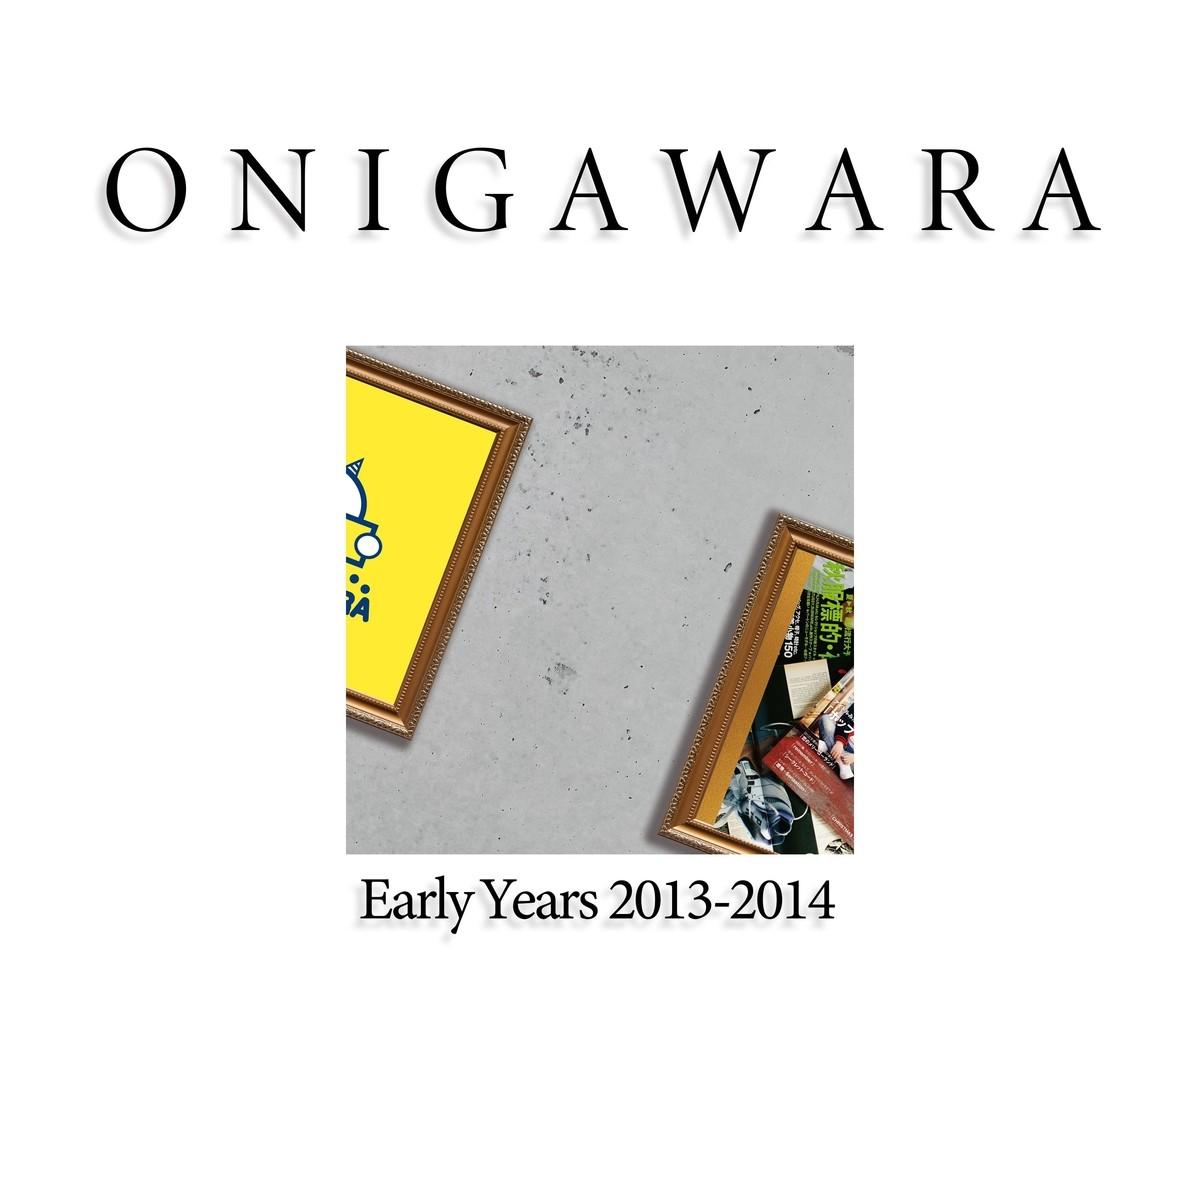 [Album] ONIGAWARA – ONIGAWARA EARLY YEARS 2013~2014 [FLAC + MP3 320 / WEB] [2020.09.23]